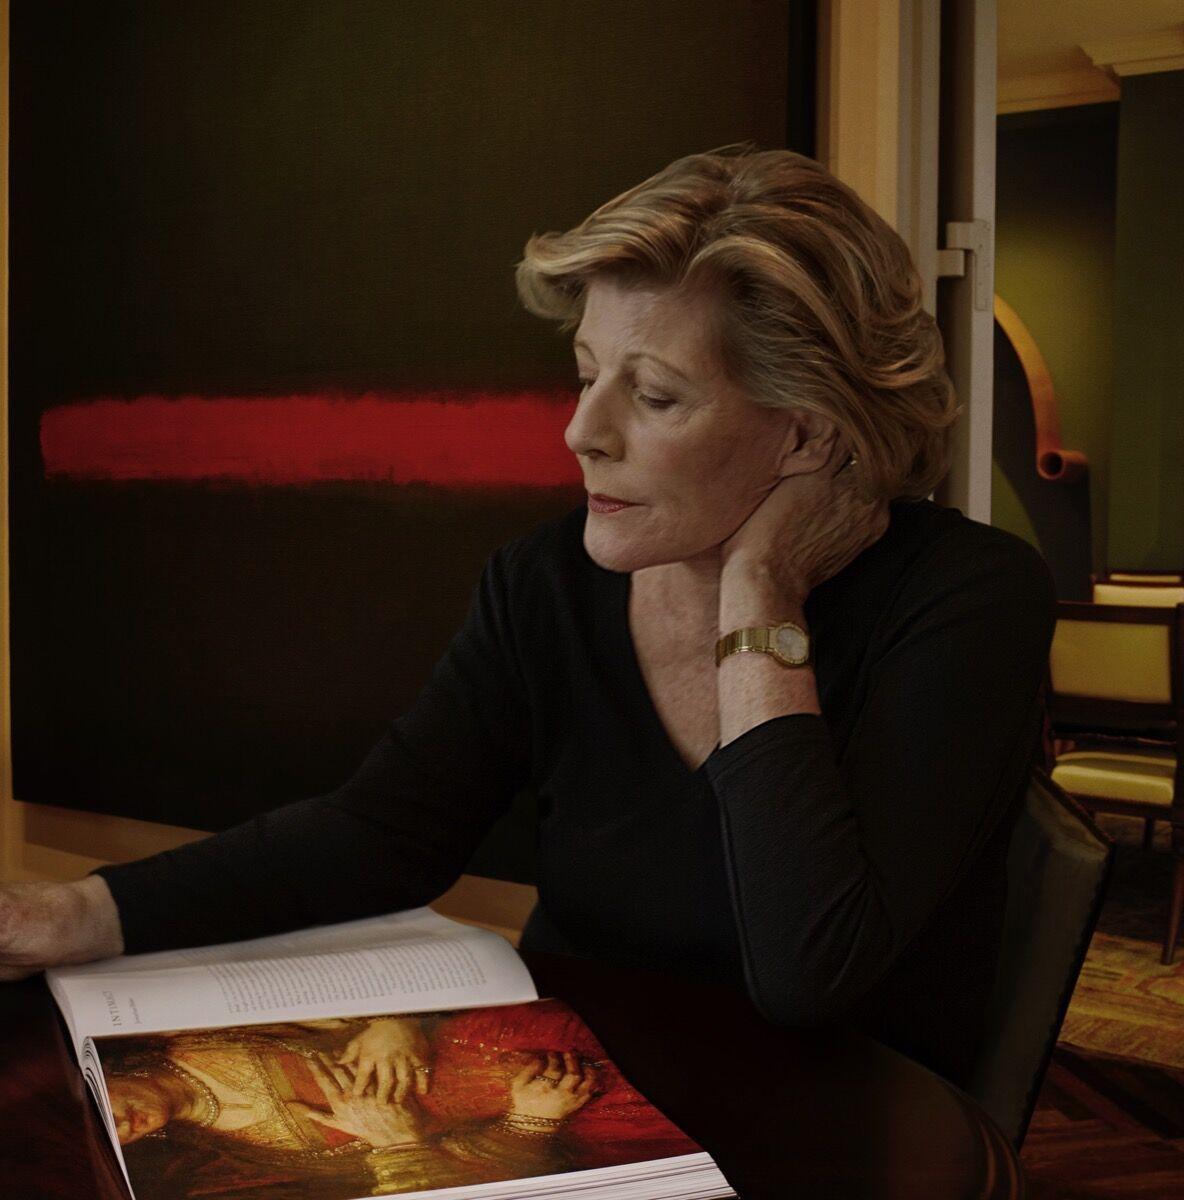 Portrait of Agnes Gund. © Annie Leibovitz. Courtesy of the Art for Justice Fund.